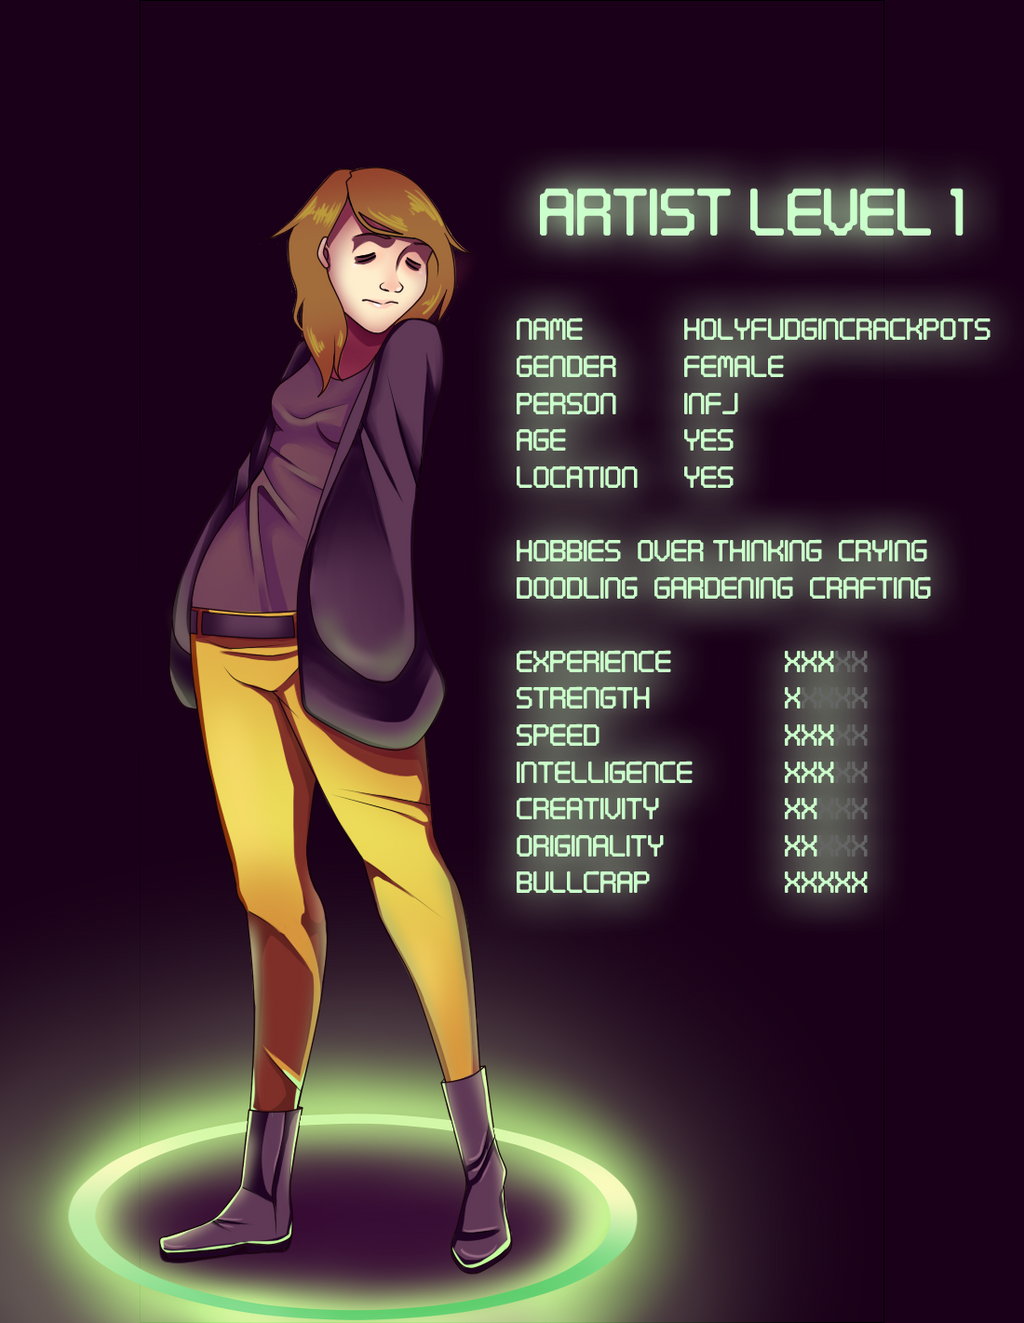 HolyFudginCrackpots's Profile Picture